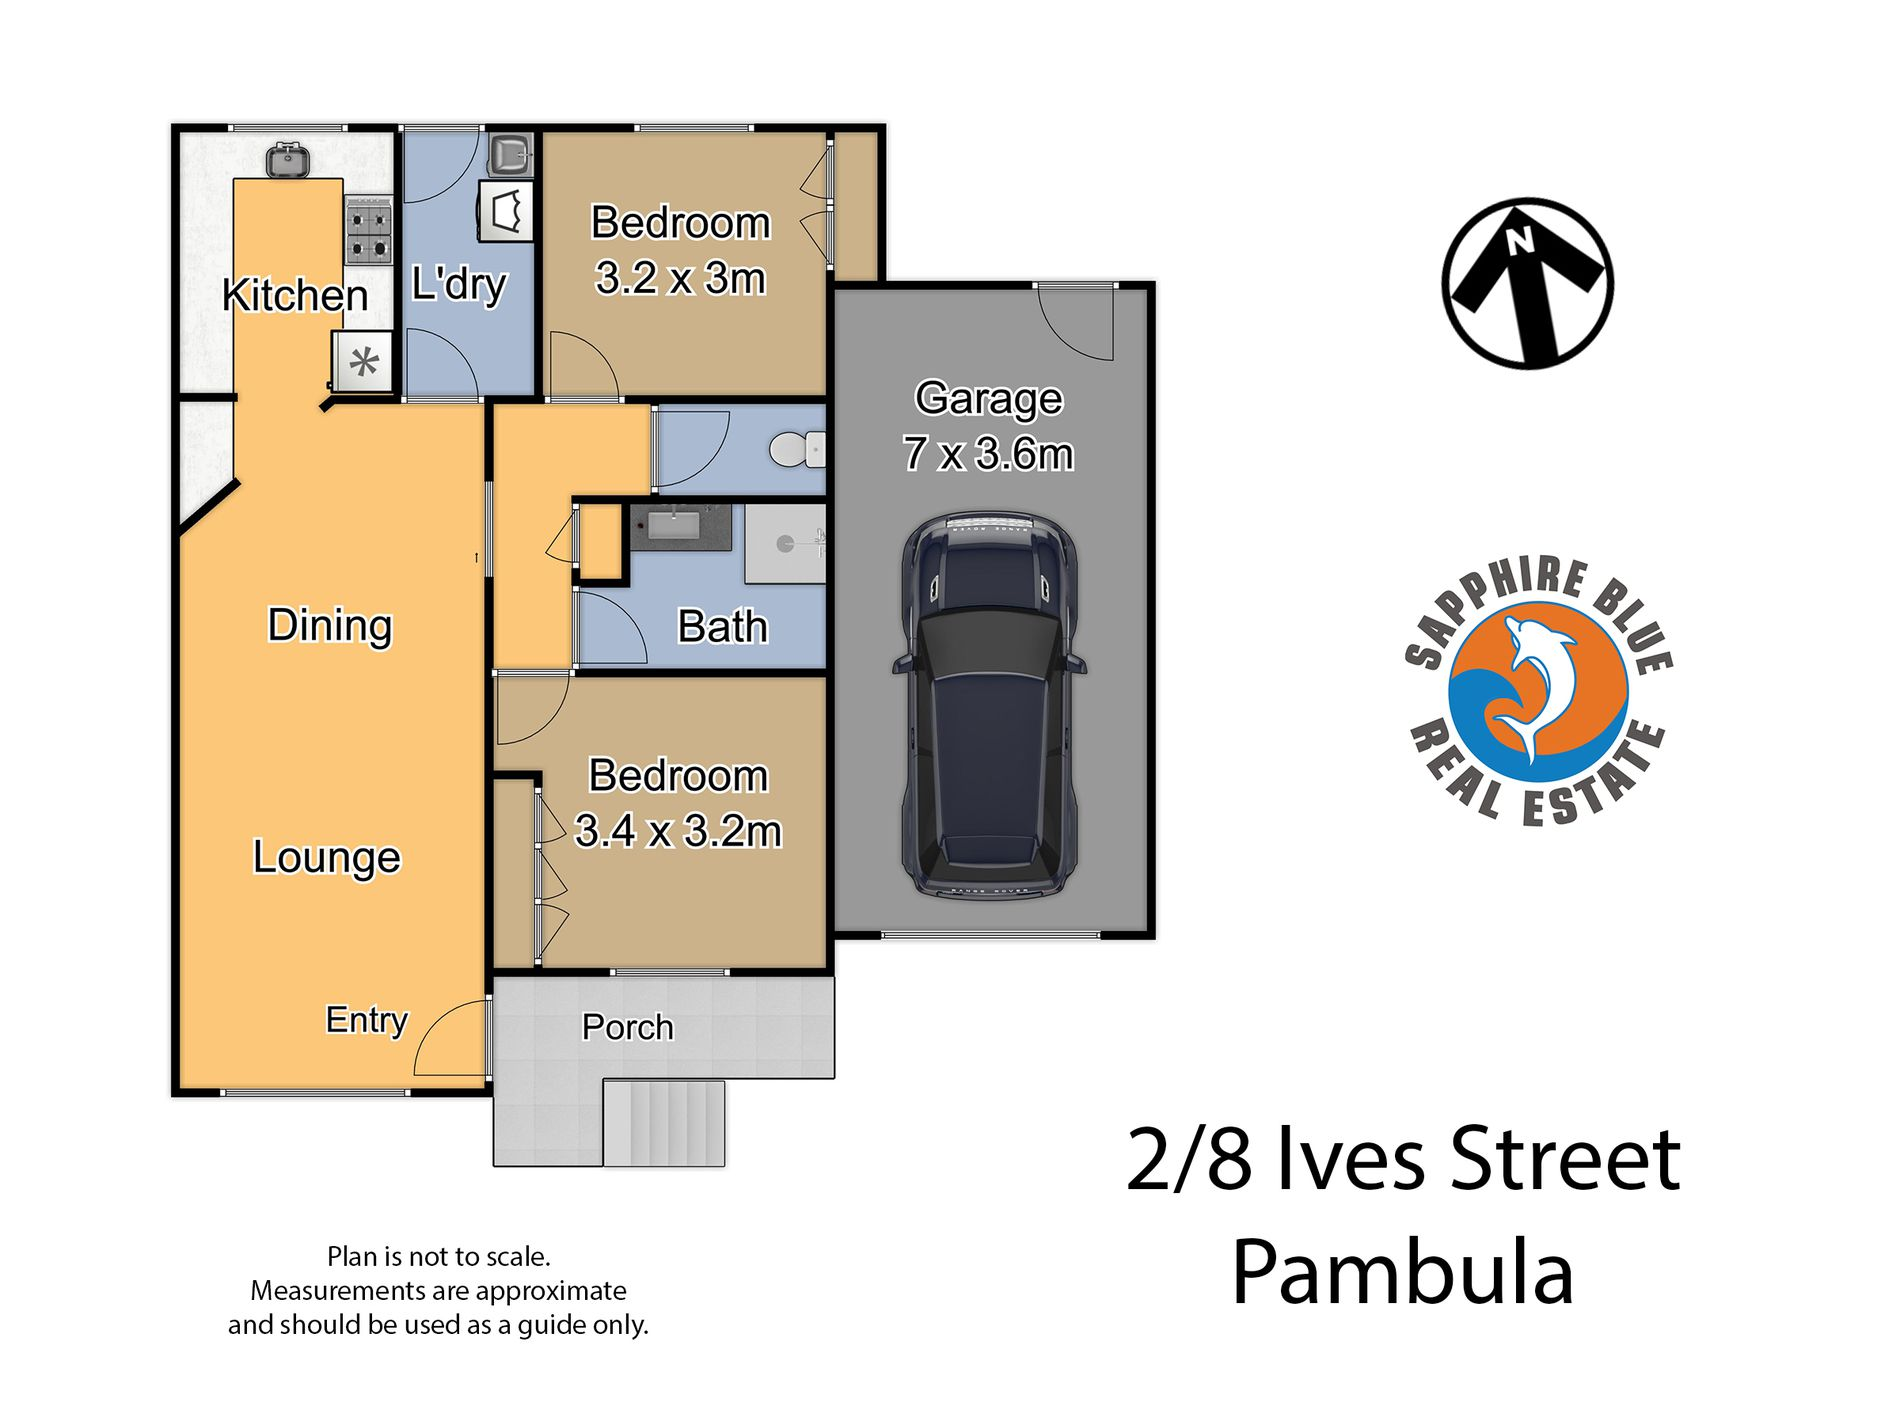 2 / 8 Ives Street, Pambula